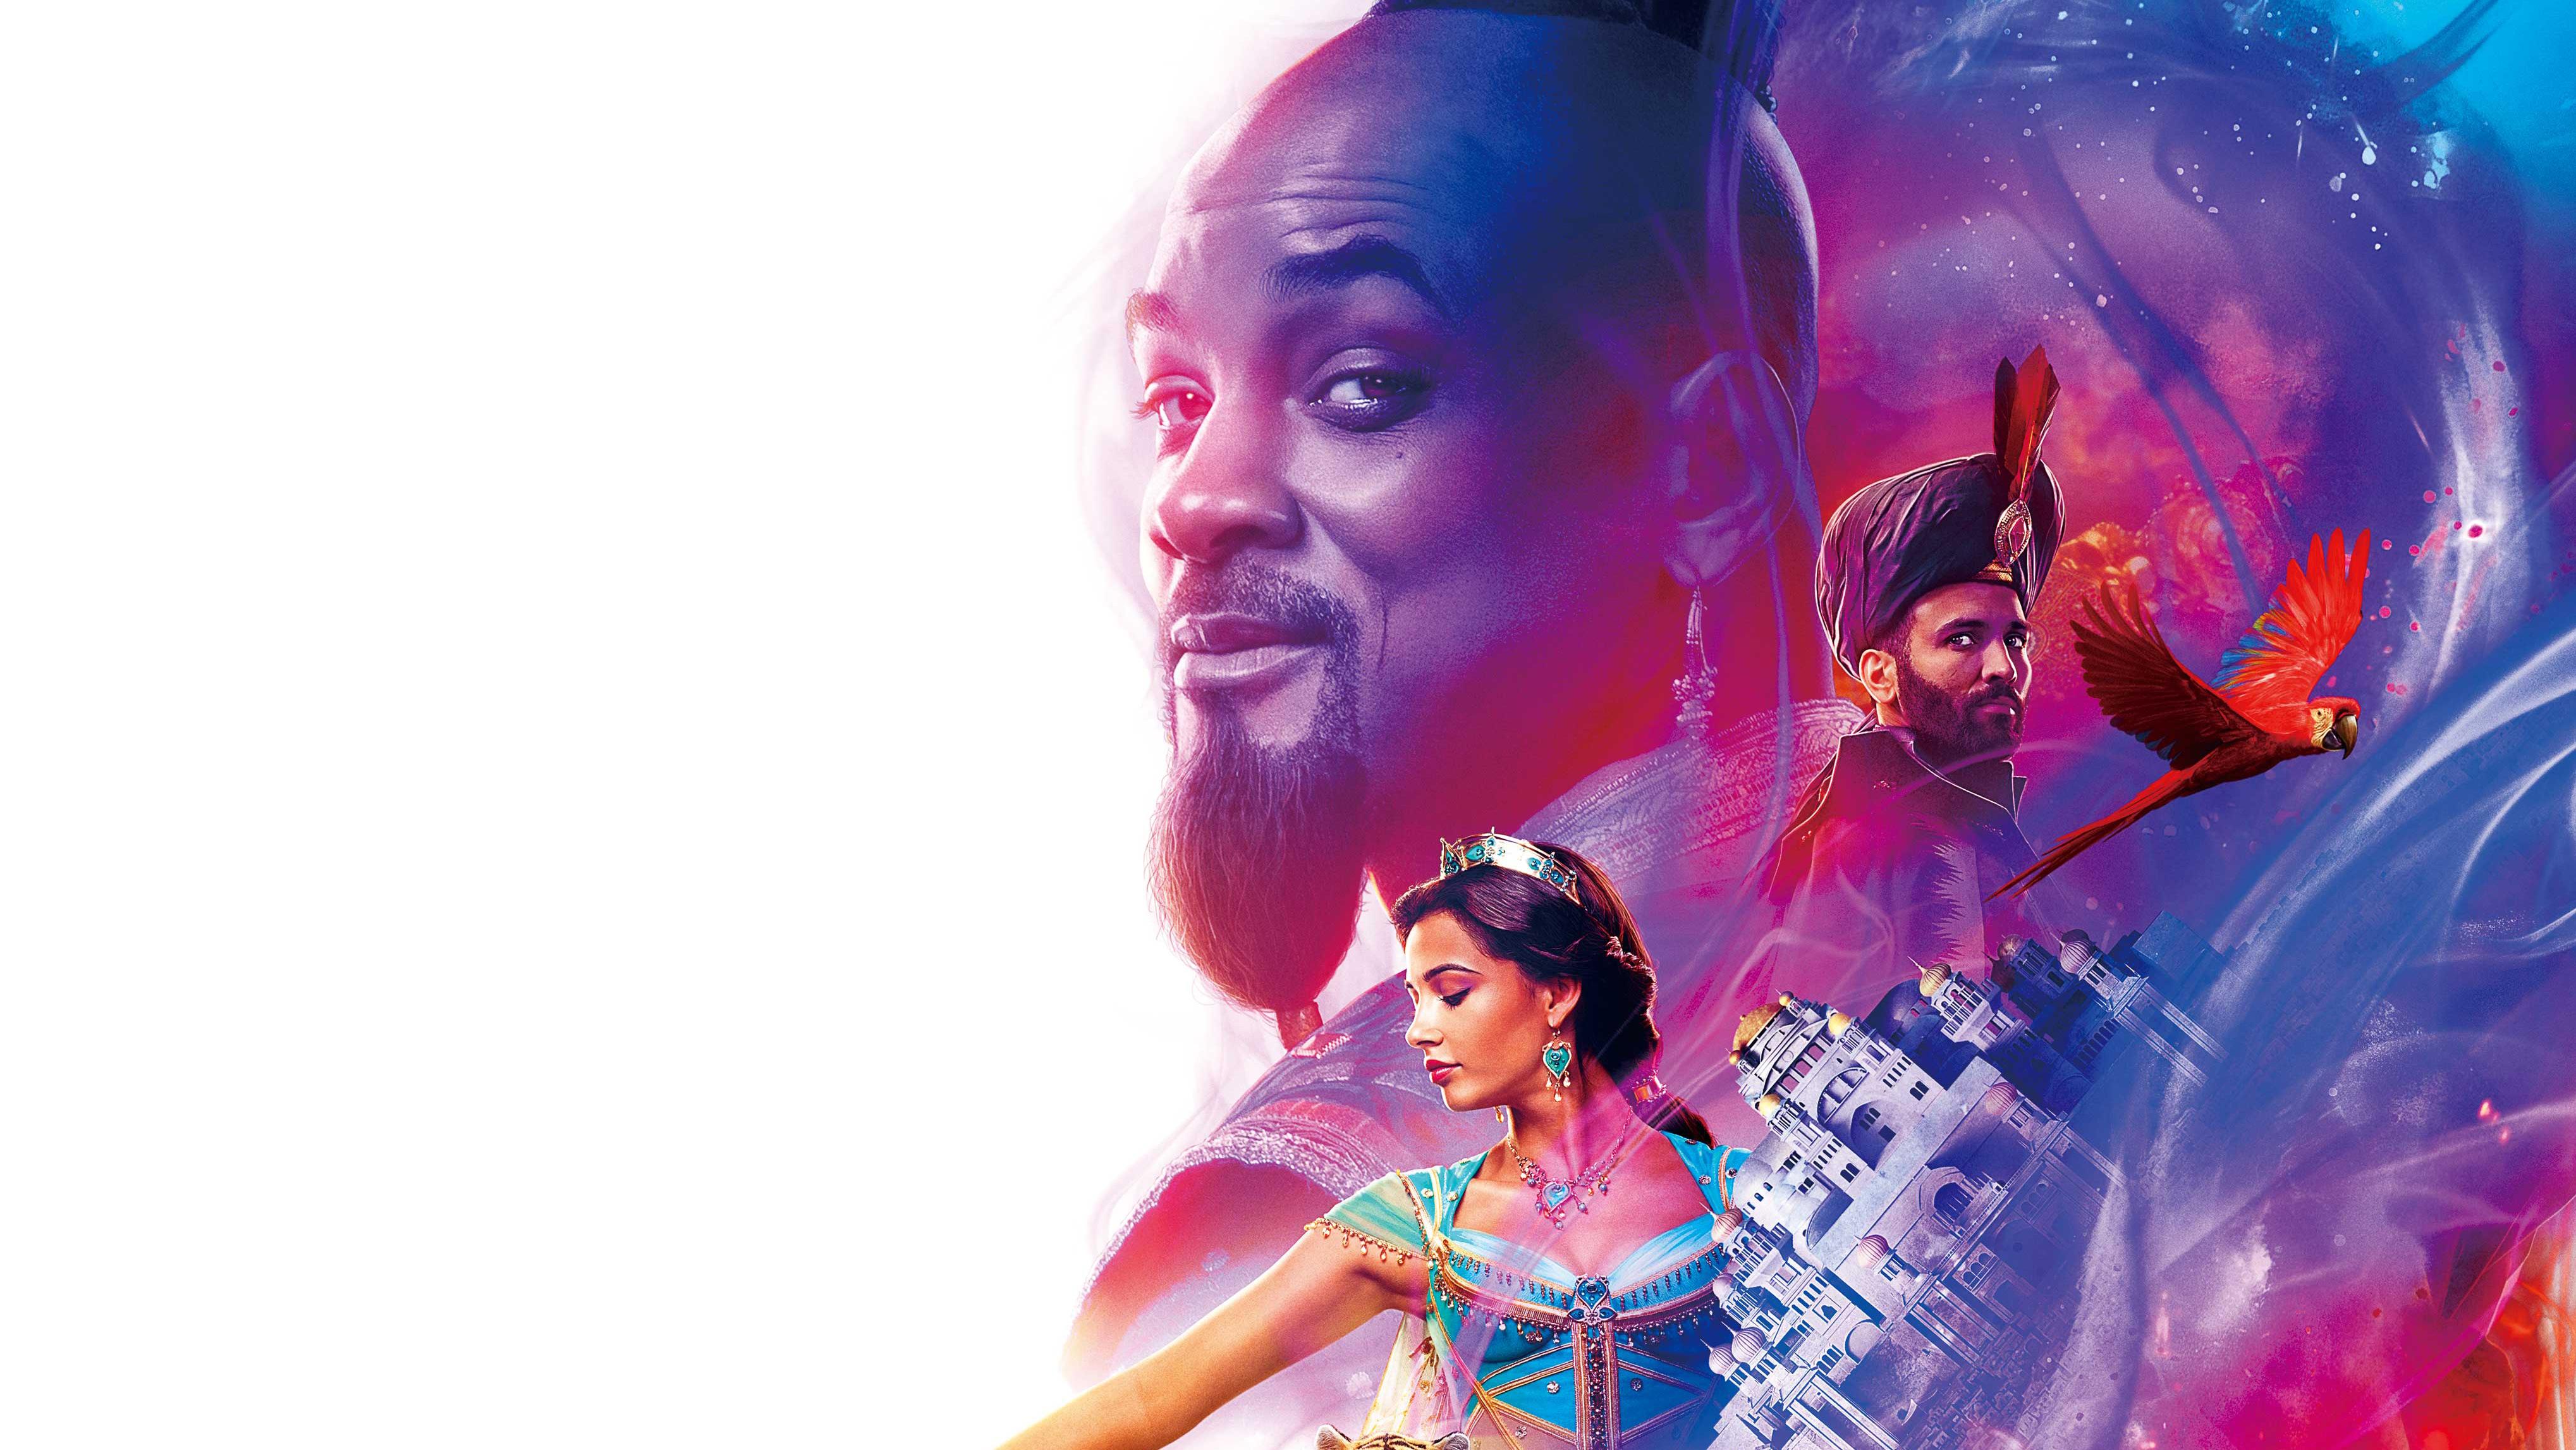 1920x1080 Aladdin Movie Poster 4k Laptop Full HD 1080P HD ...